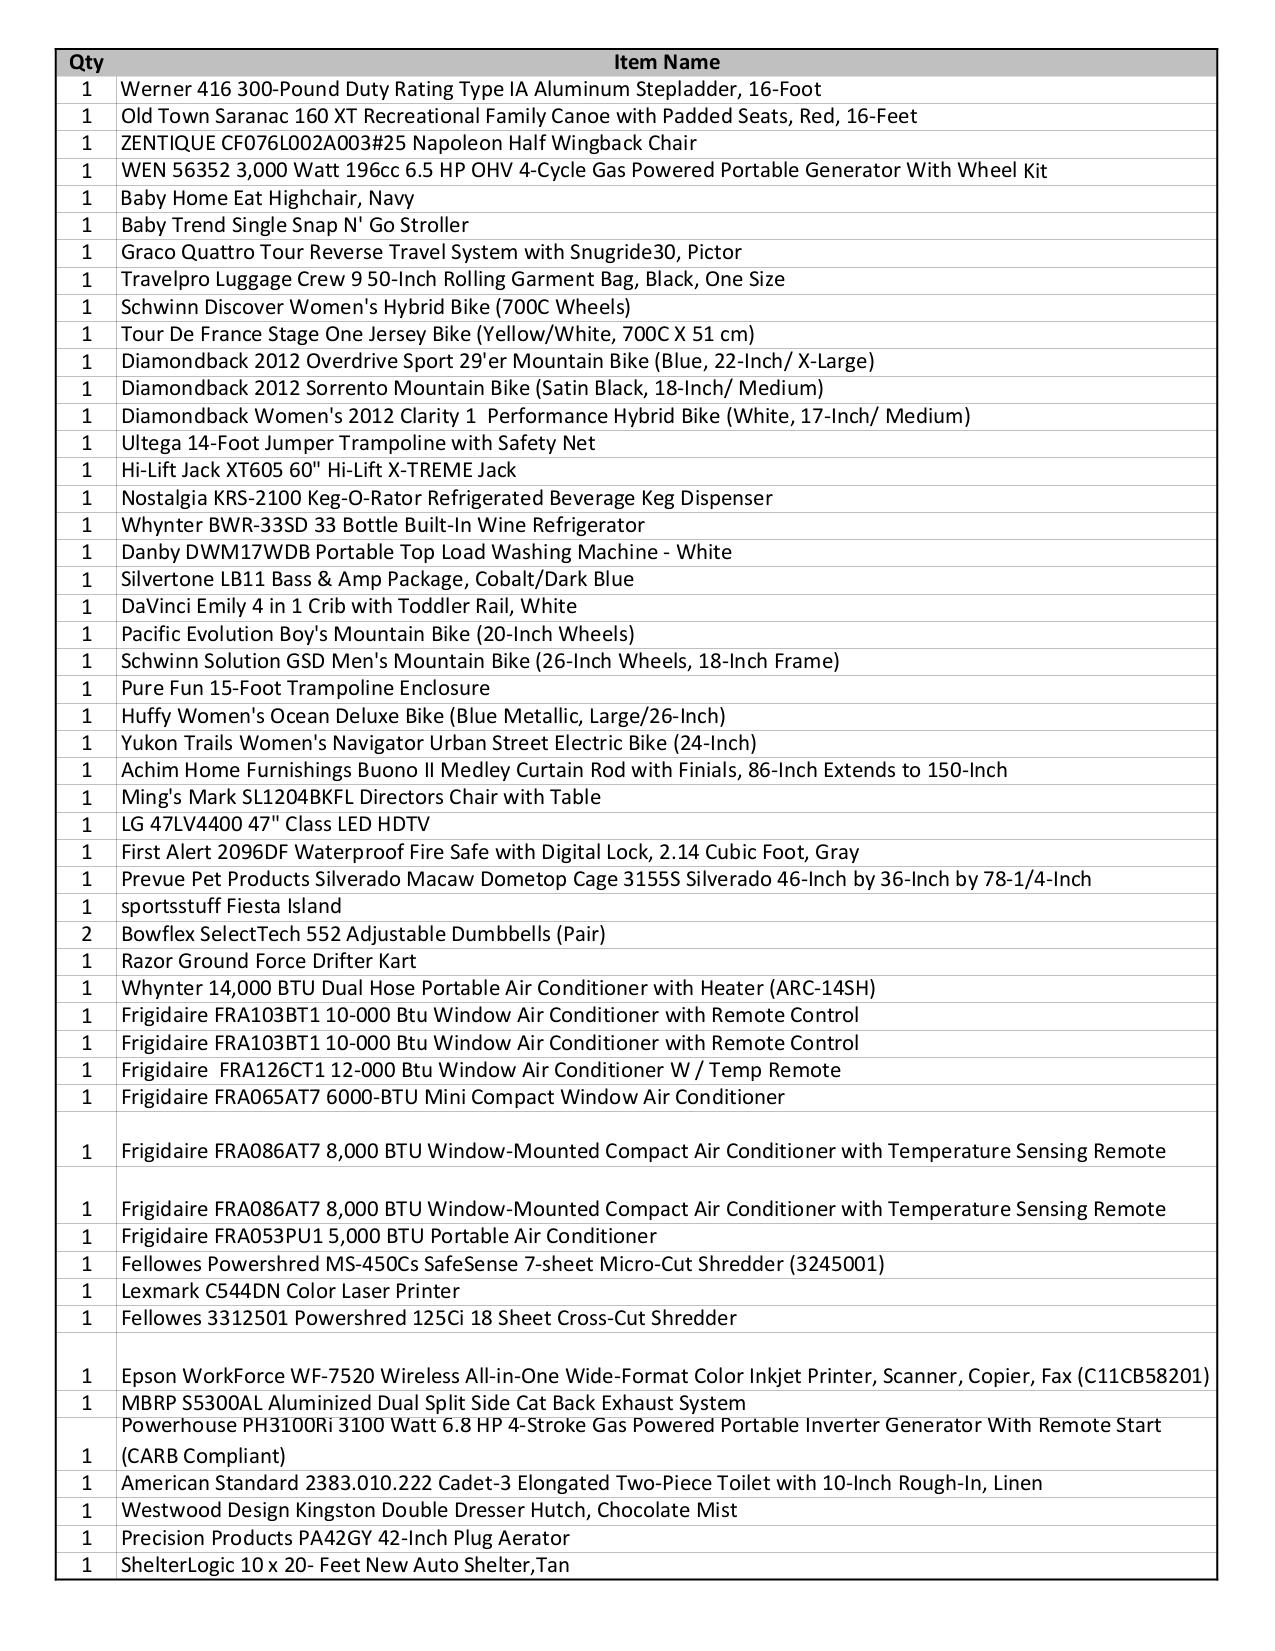 pdf for Whynter Freezer FM-65G manual